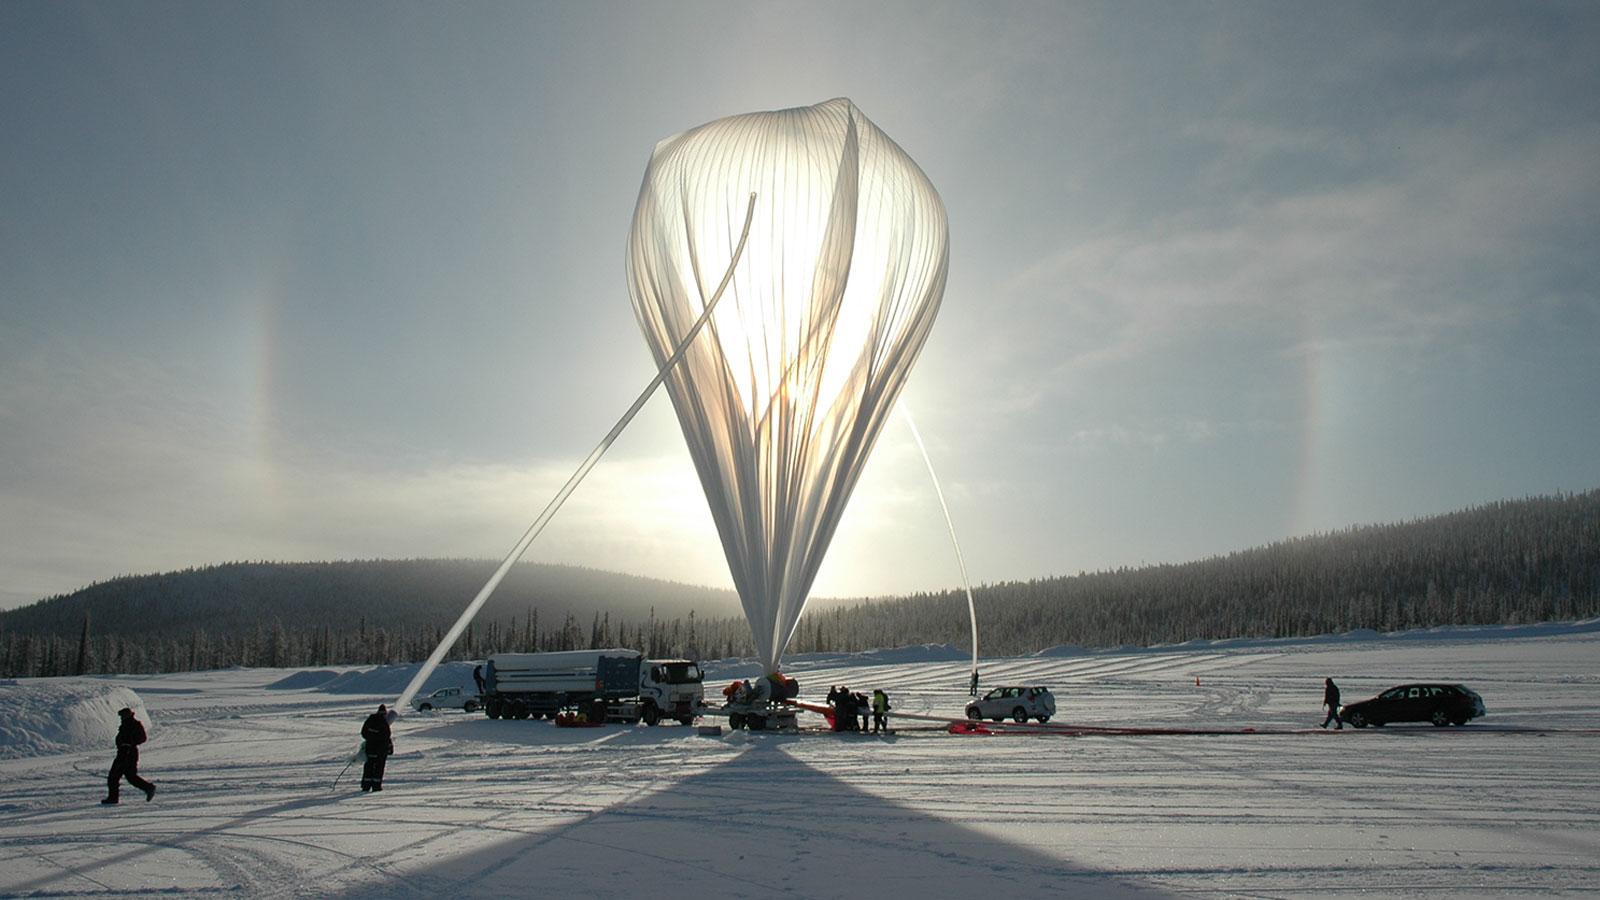 Balloon launch at Esrange Space Center, 2007.